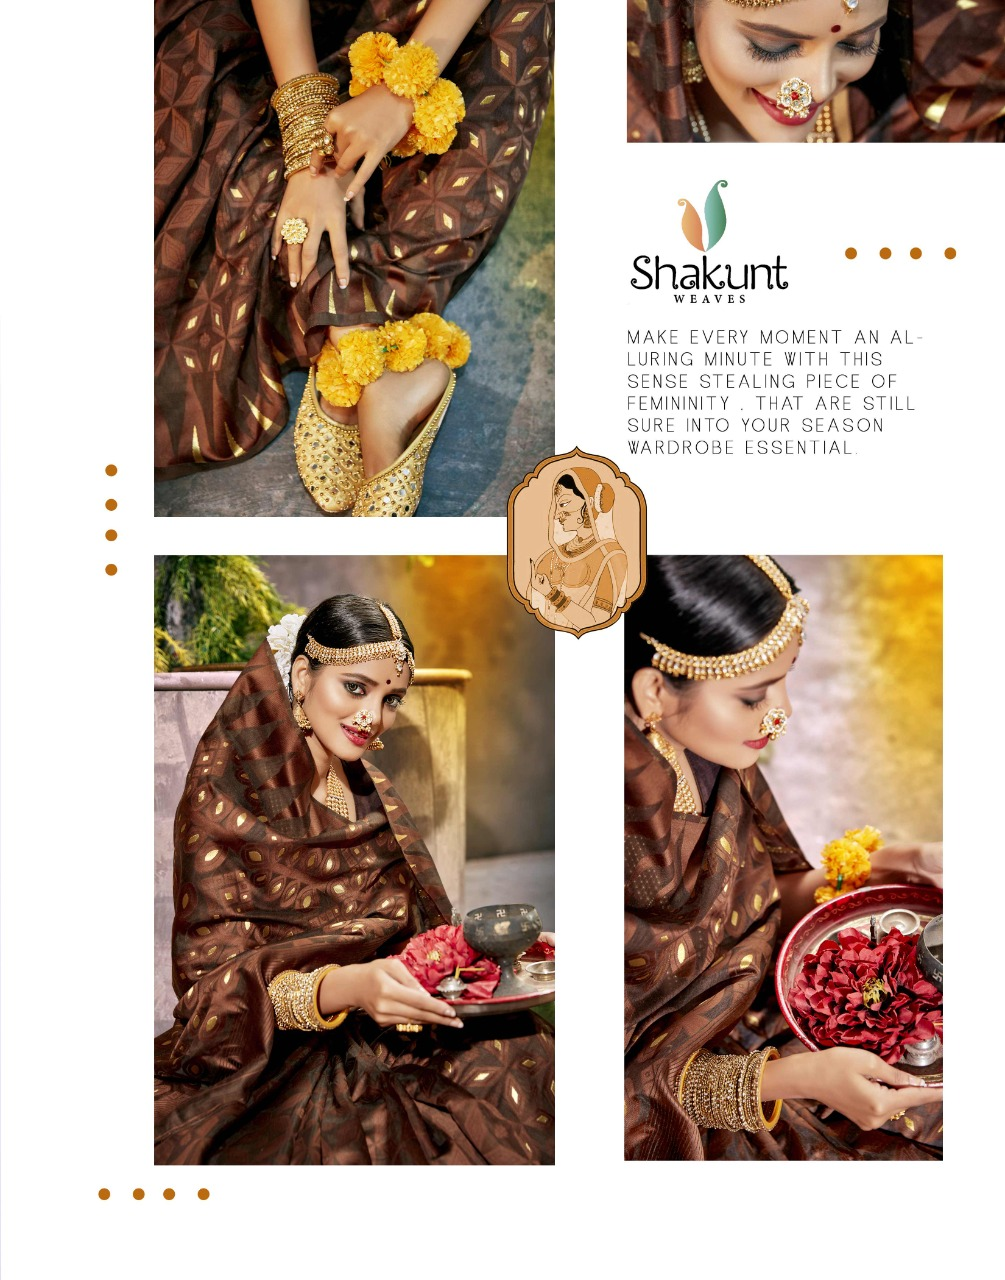 Shakunt Lokpriya Cotton Weaving Printed Sarees Wholesale